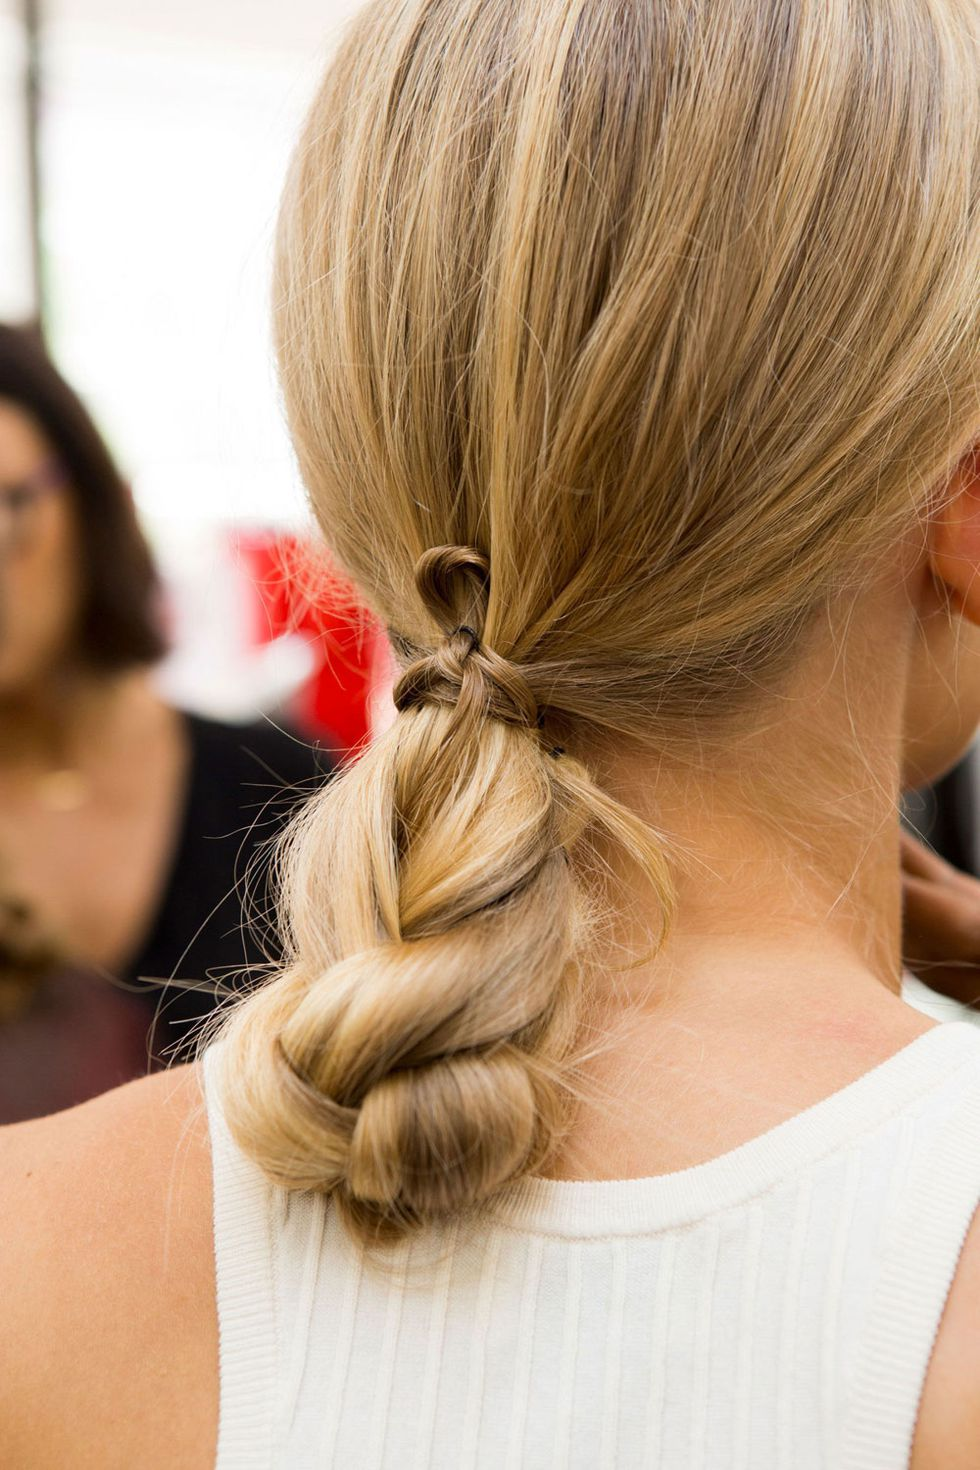 wedding-guest-hair-braid-style-beauty-blonde-low-ponytail.jpg